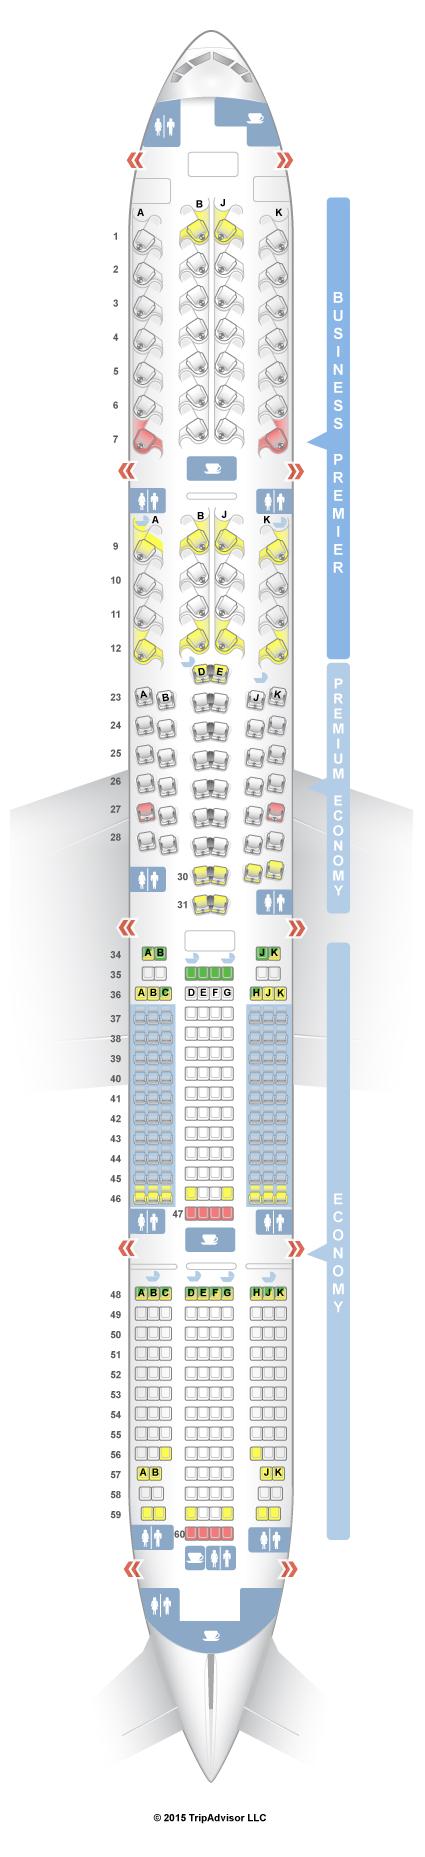 Air_New_Zealand_Boeing_777-300.jpg